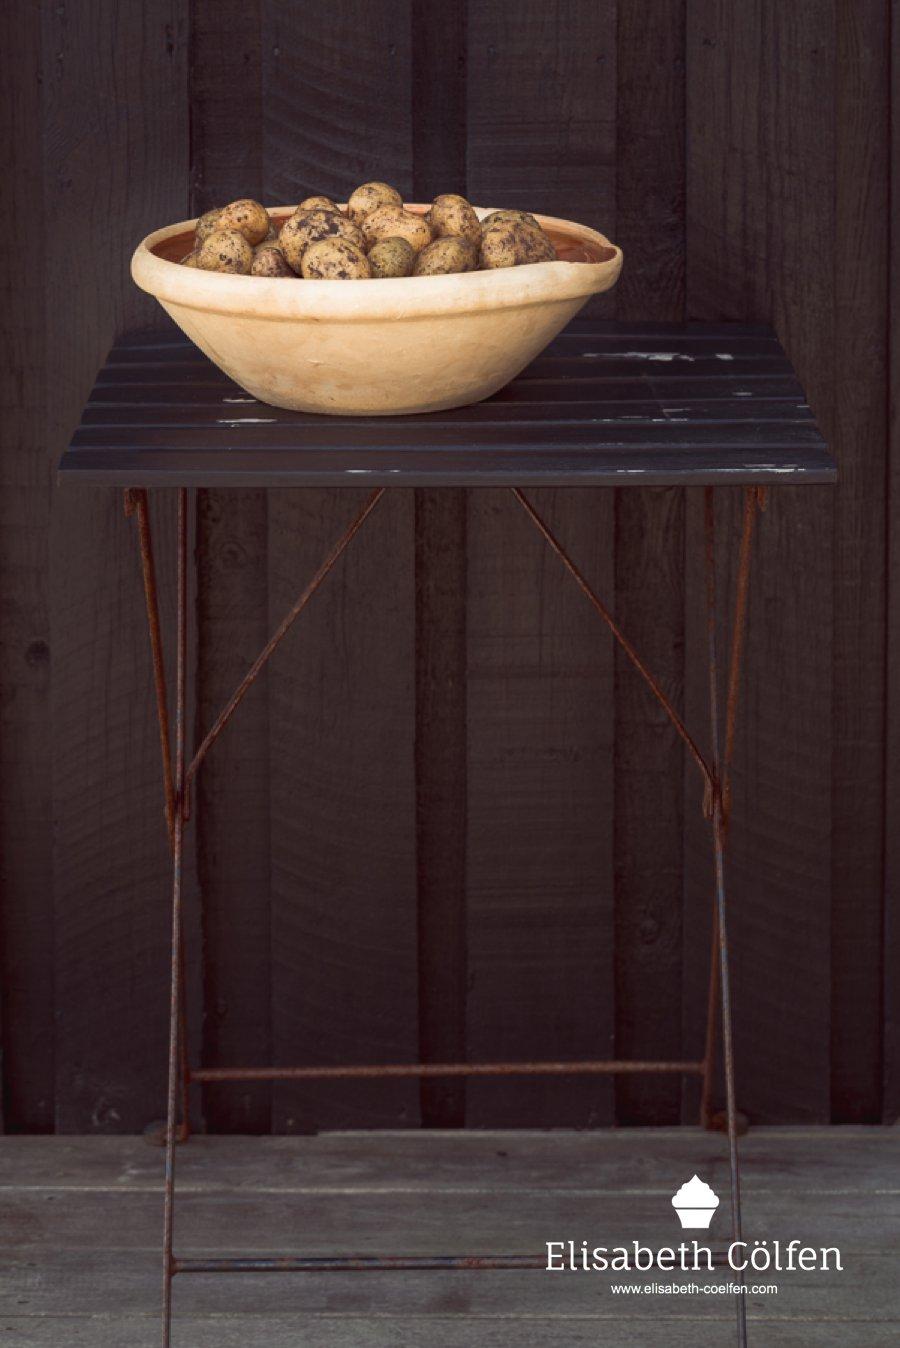 Local Danish potatoes in a big bowl outside